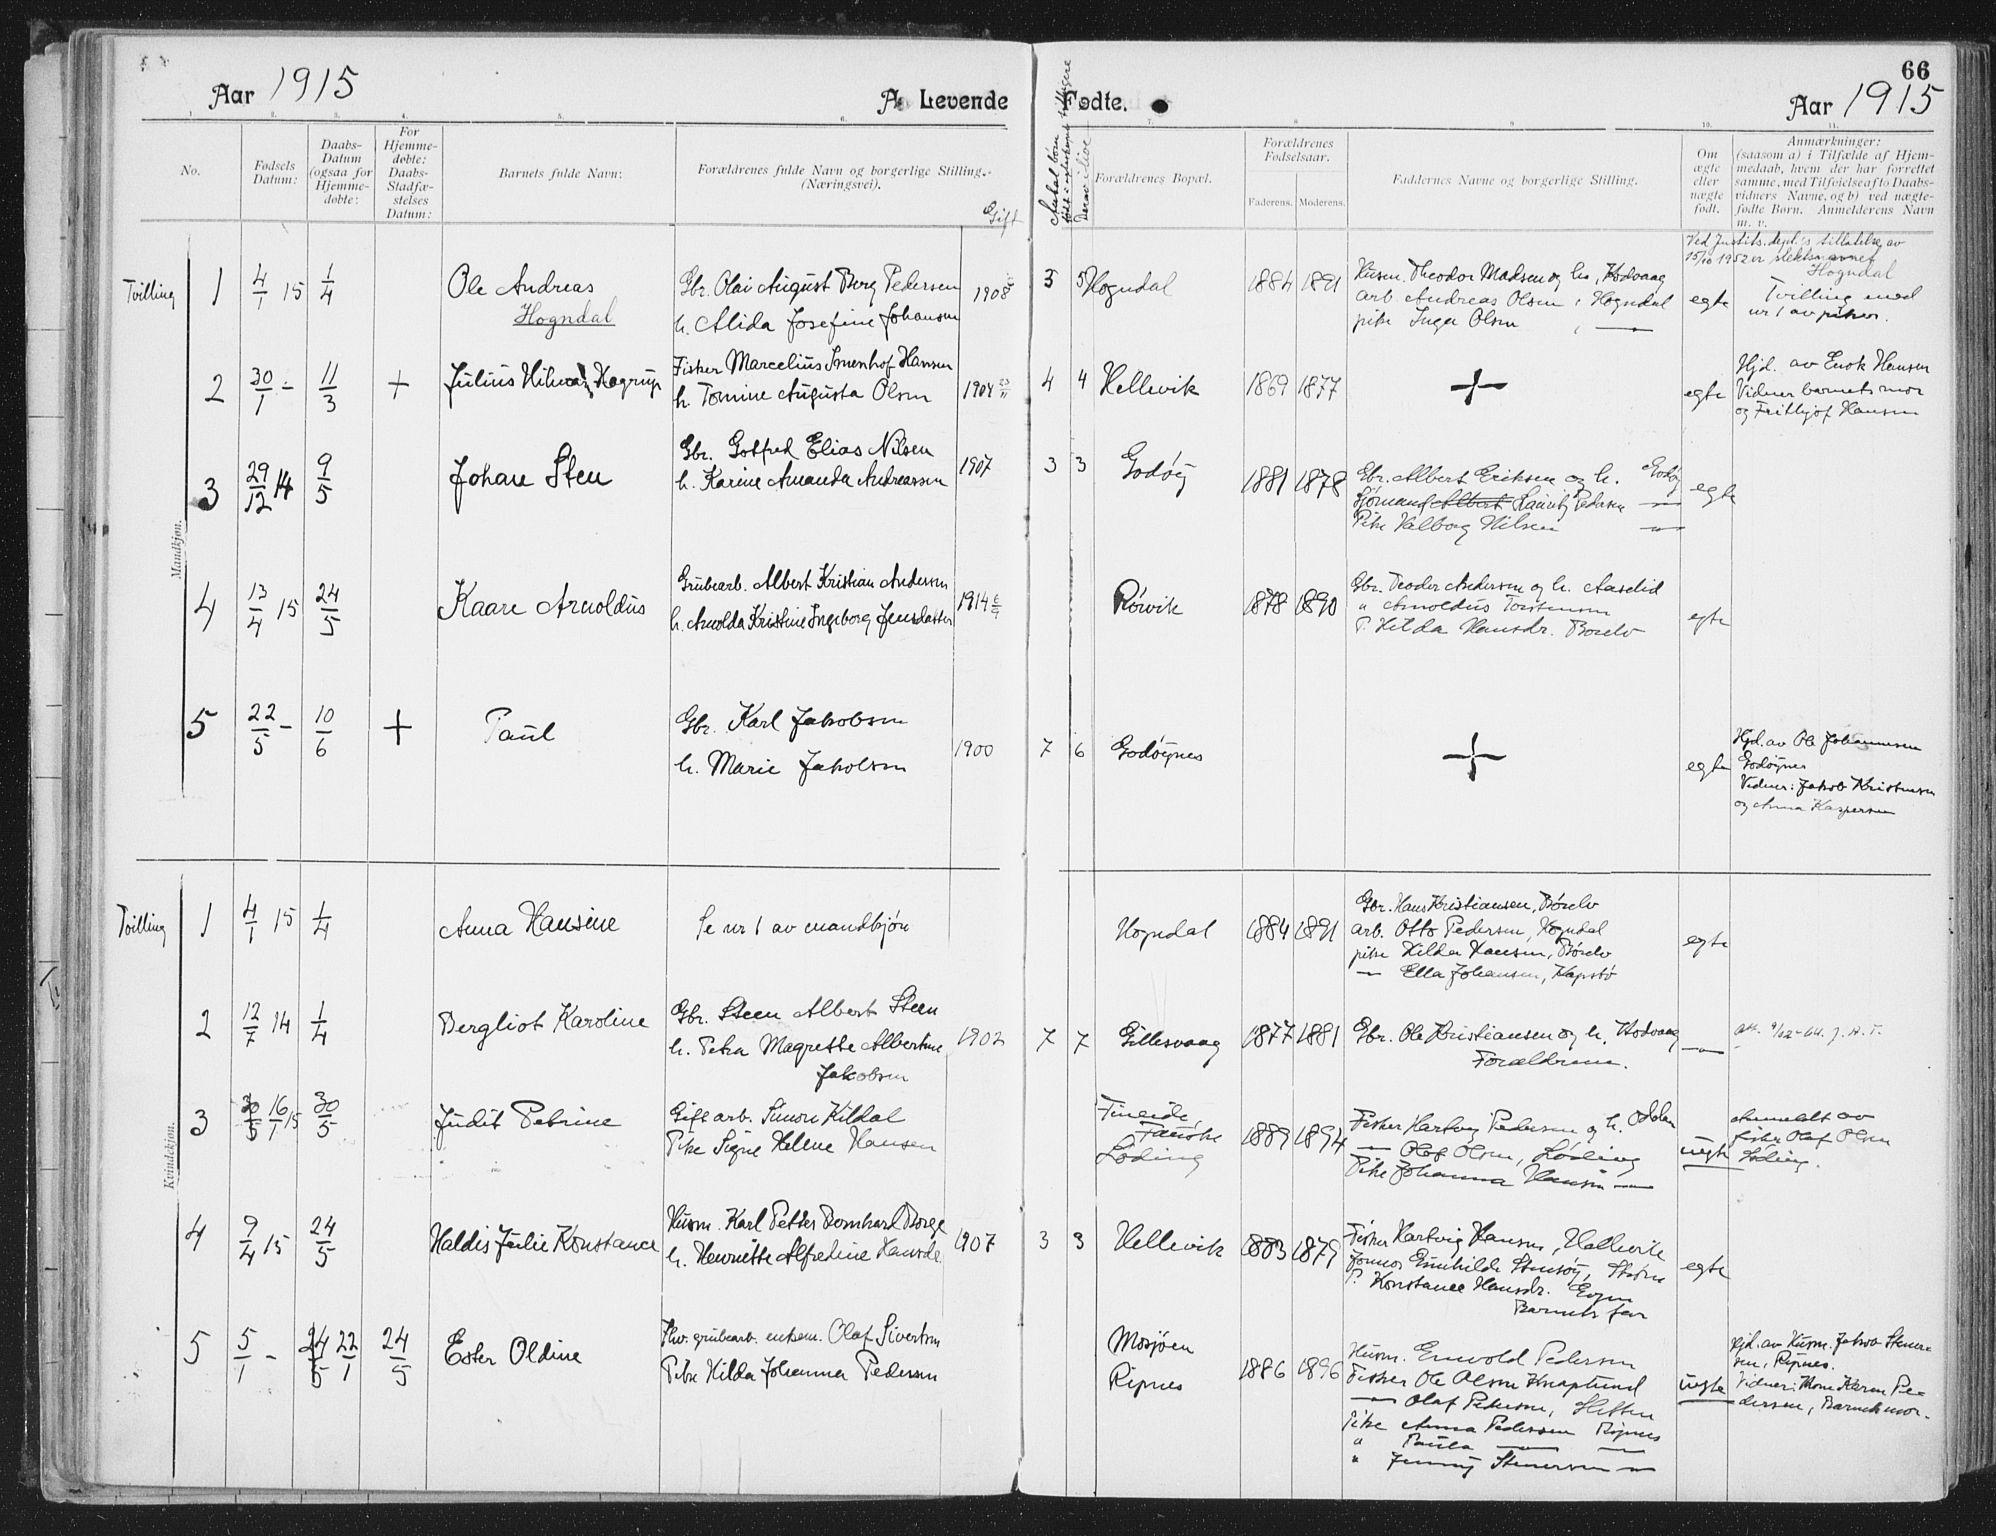 SAT, Ministerialprotokoller, klokkerbøker og fødselsregistre - Nordland, 804/L0081: Ministerialbok nr. 804A02, 1901-1915, s. 66